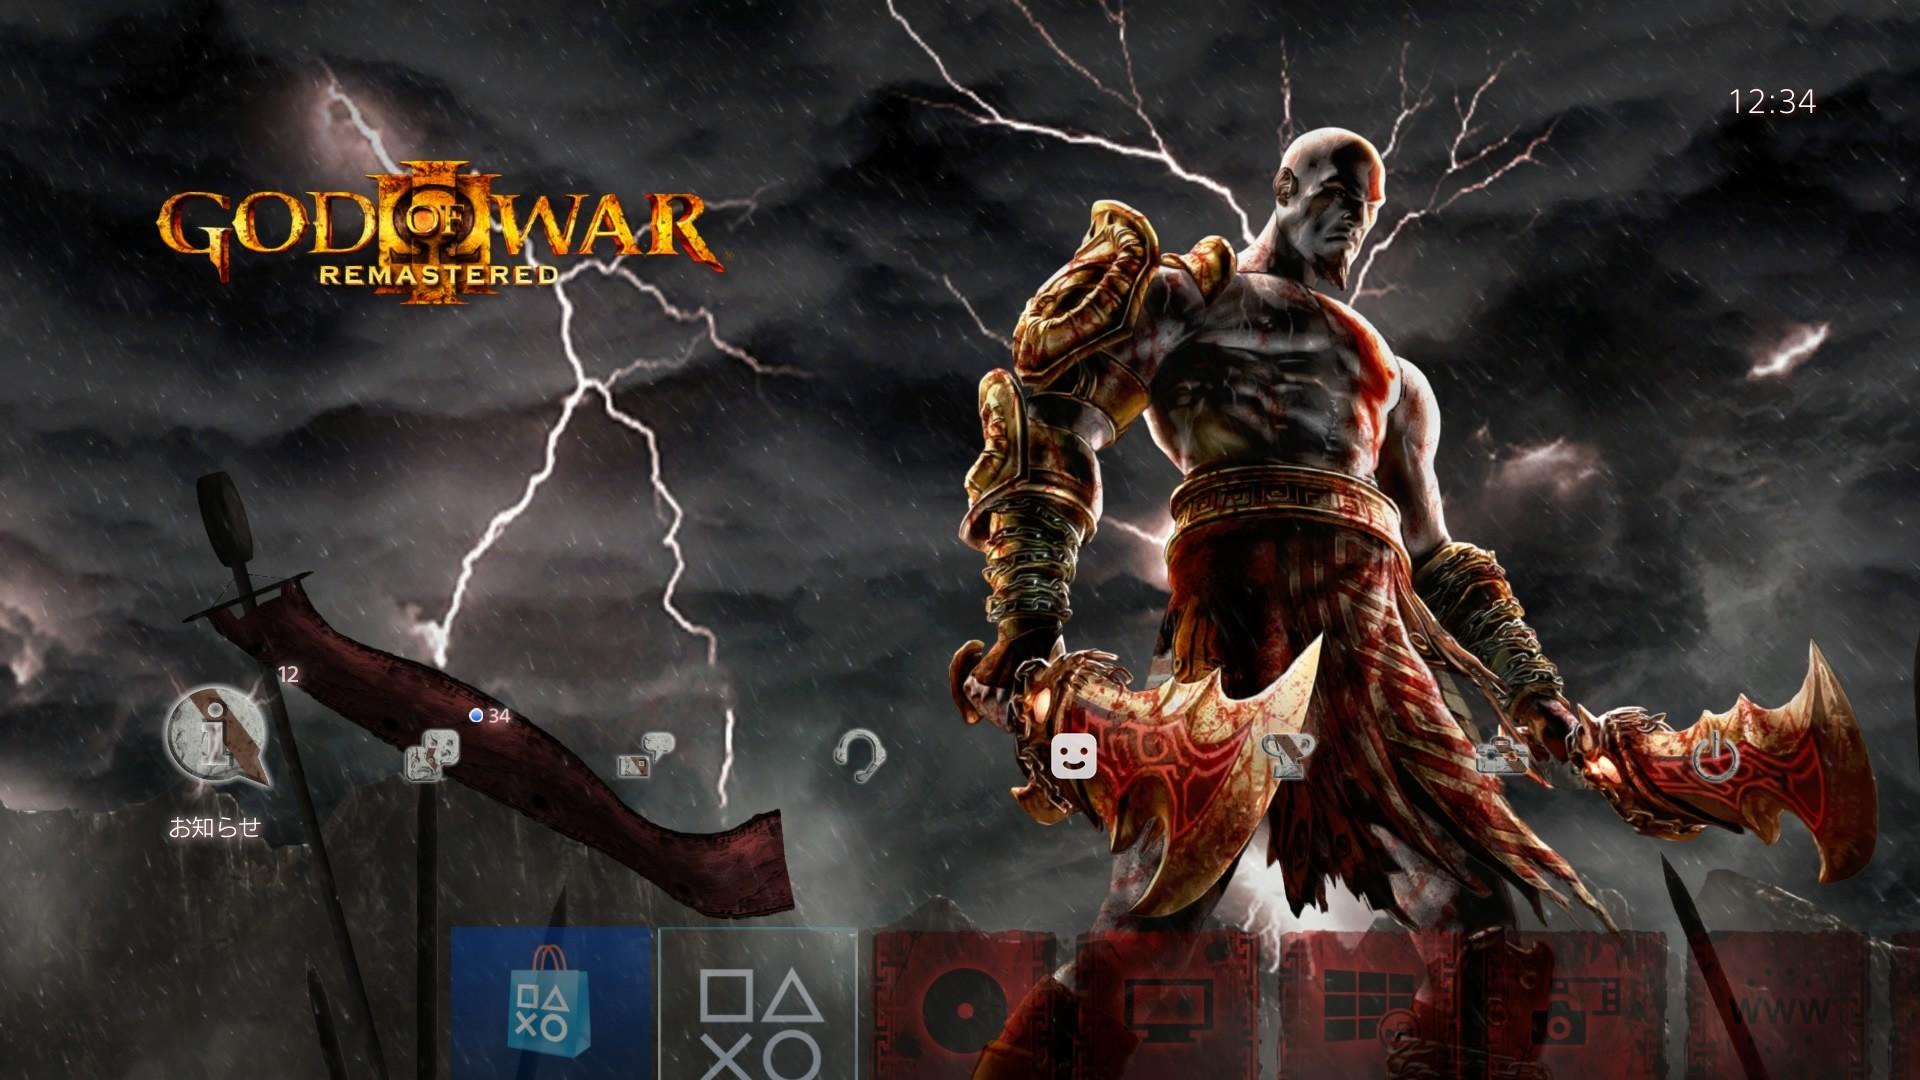 God Of War Iii Wallpapers Video Game Hq God Of War Iii